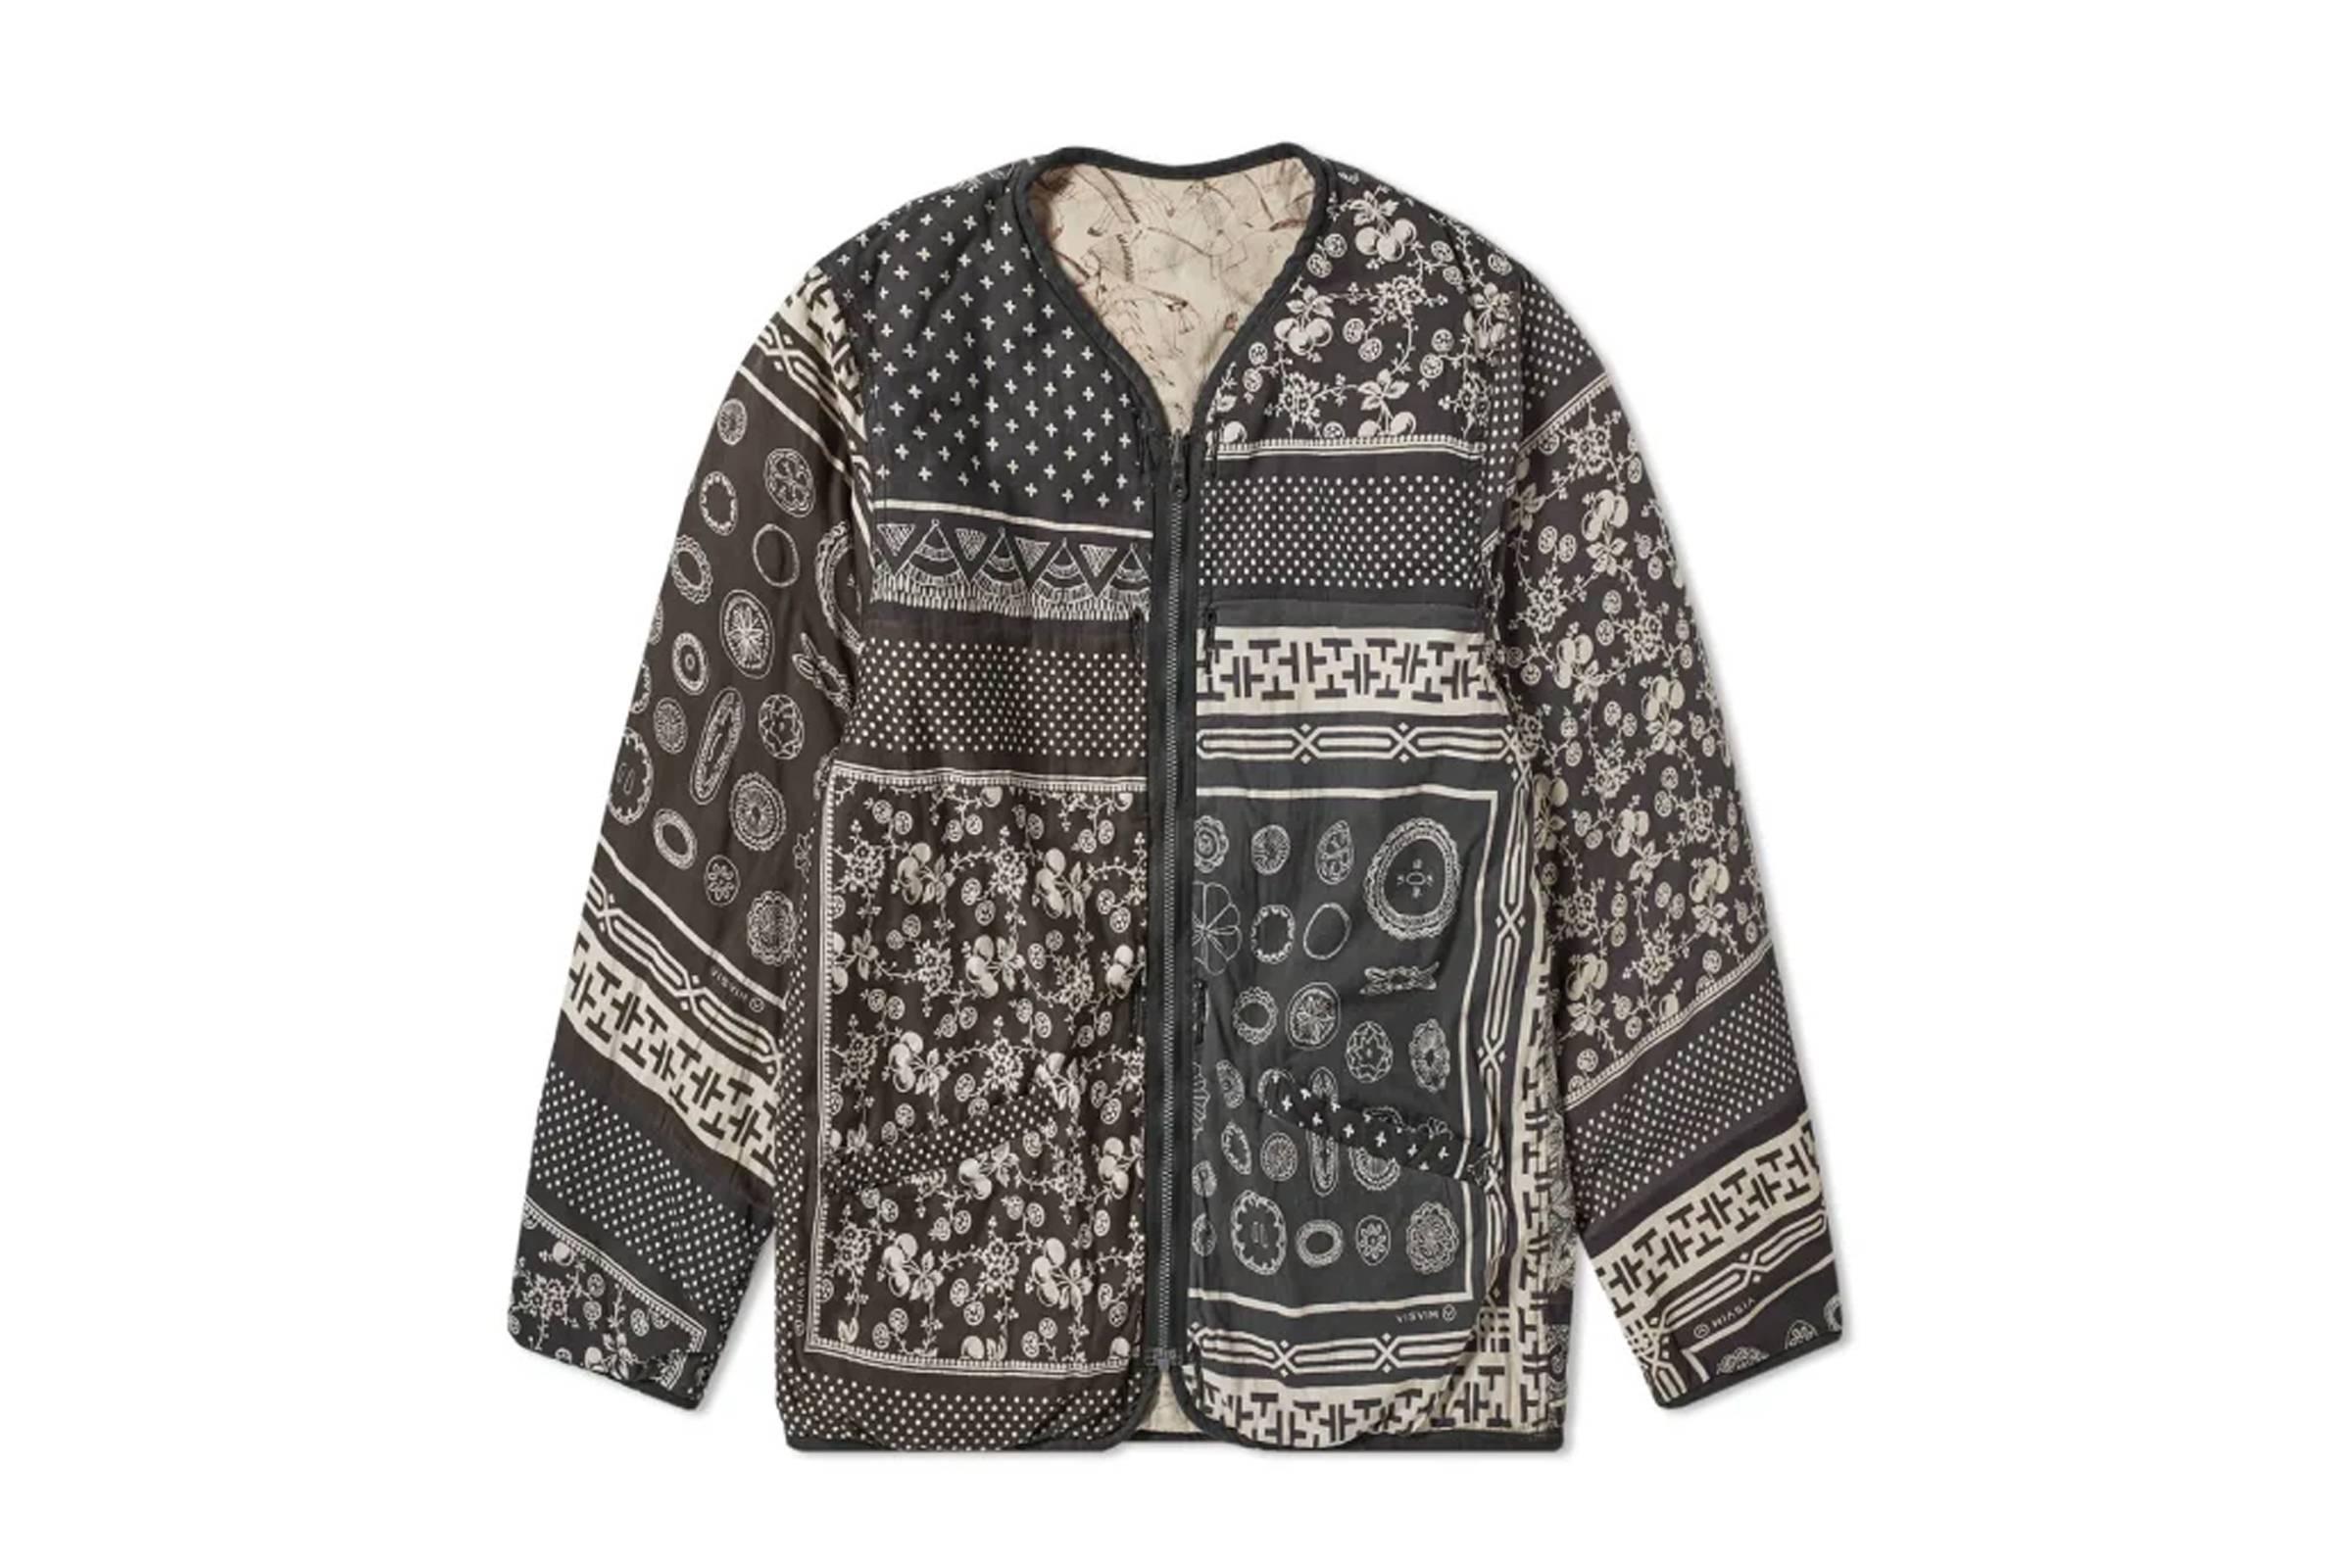 Visvim ICT Iris Kerchief Liner Jacket